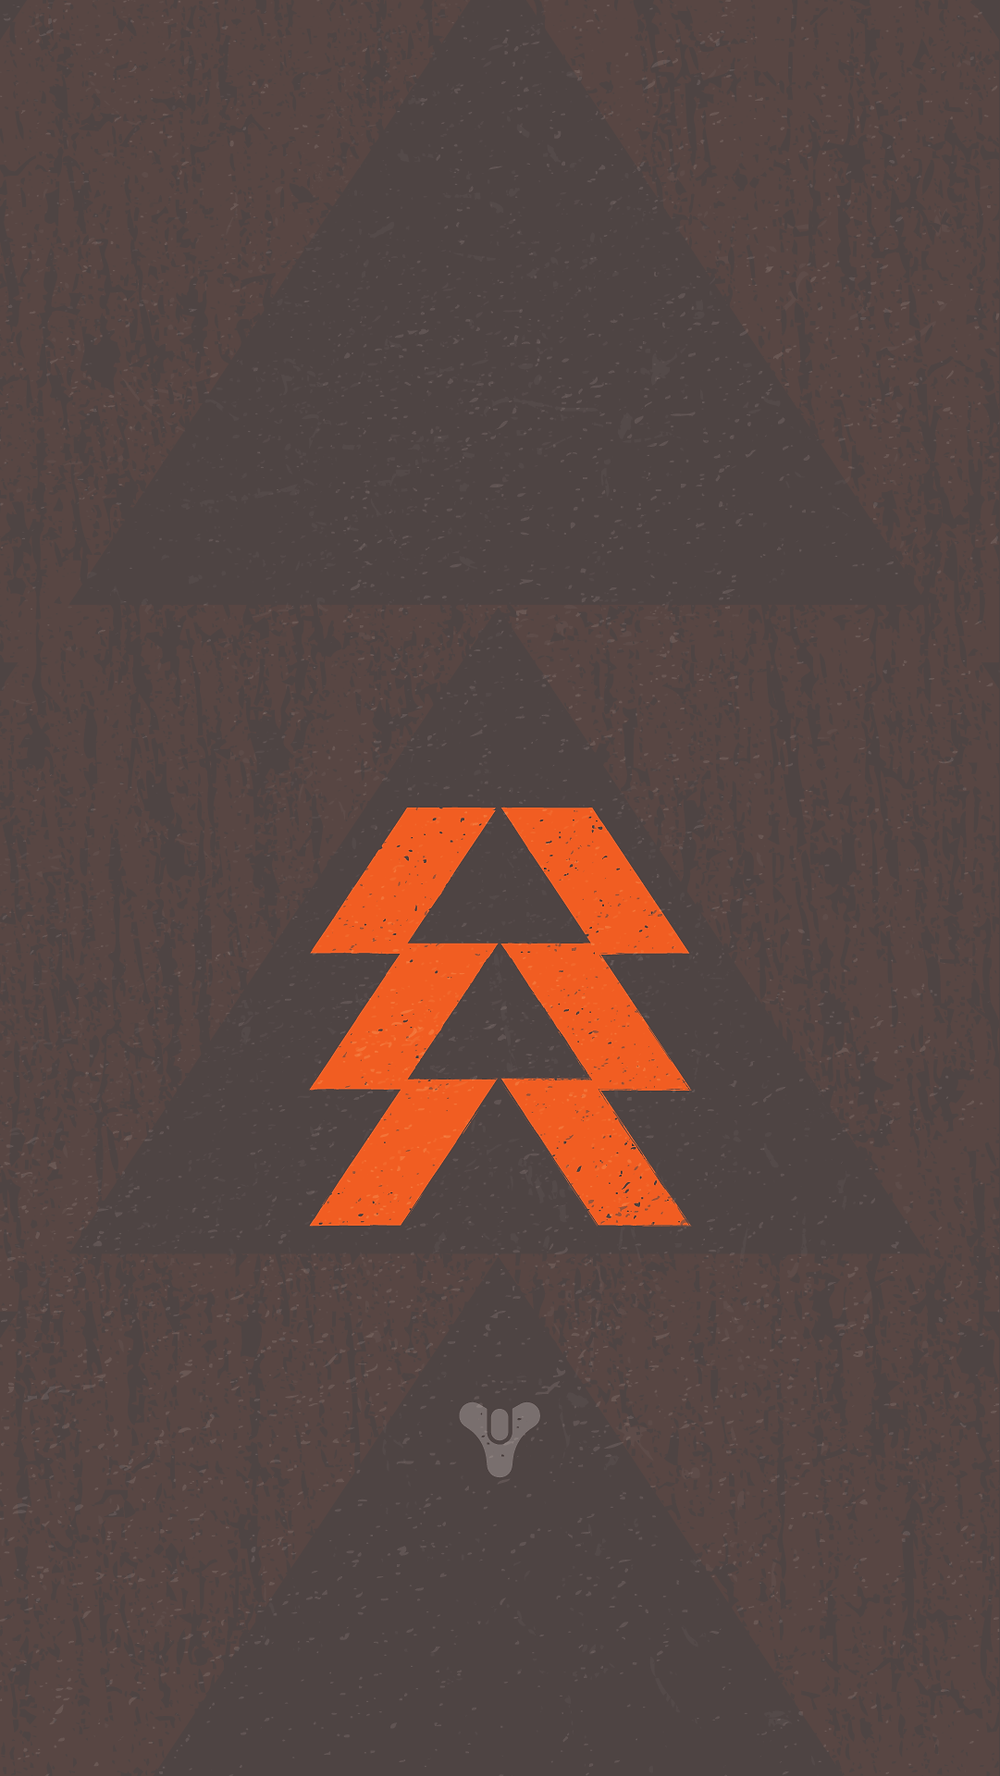 HUNTER CLASS (Orange) - 1080x1920.png